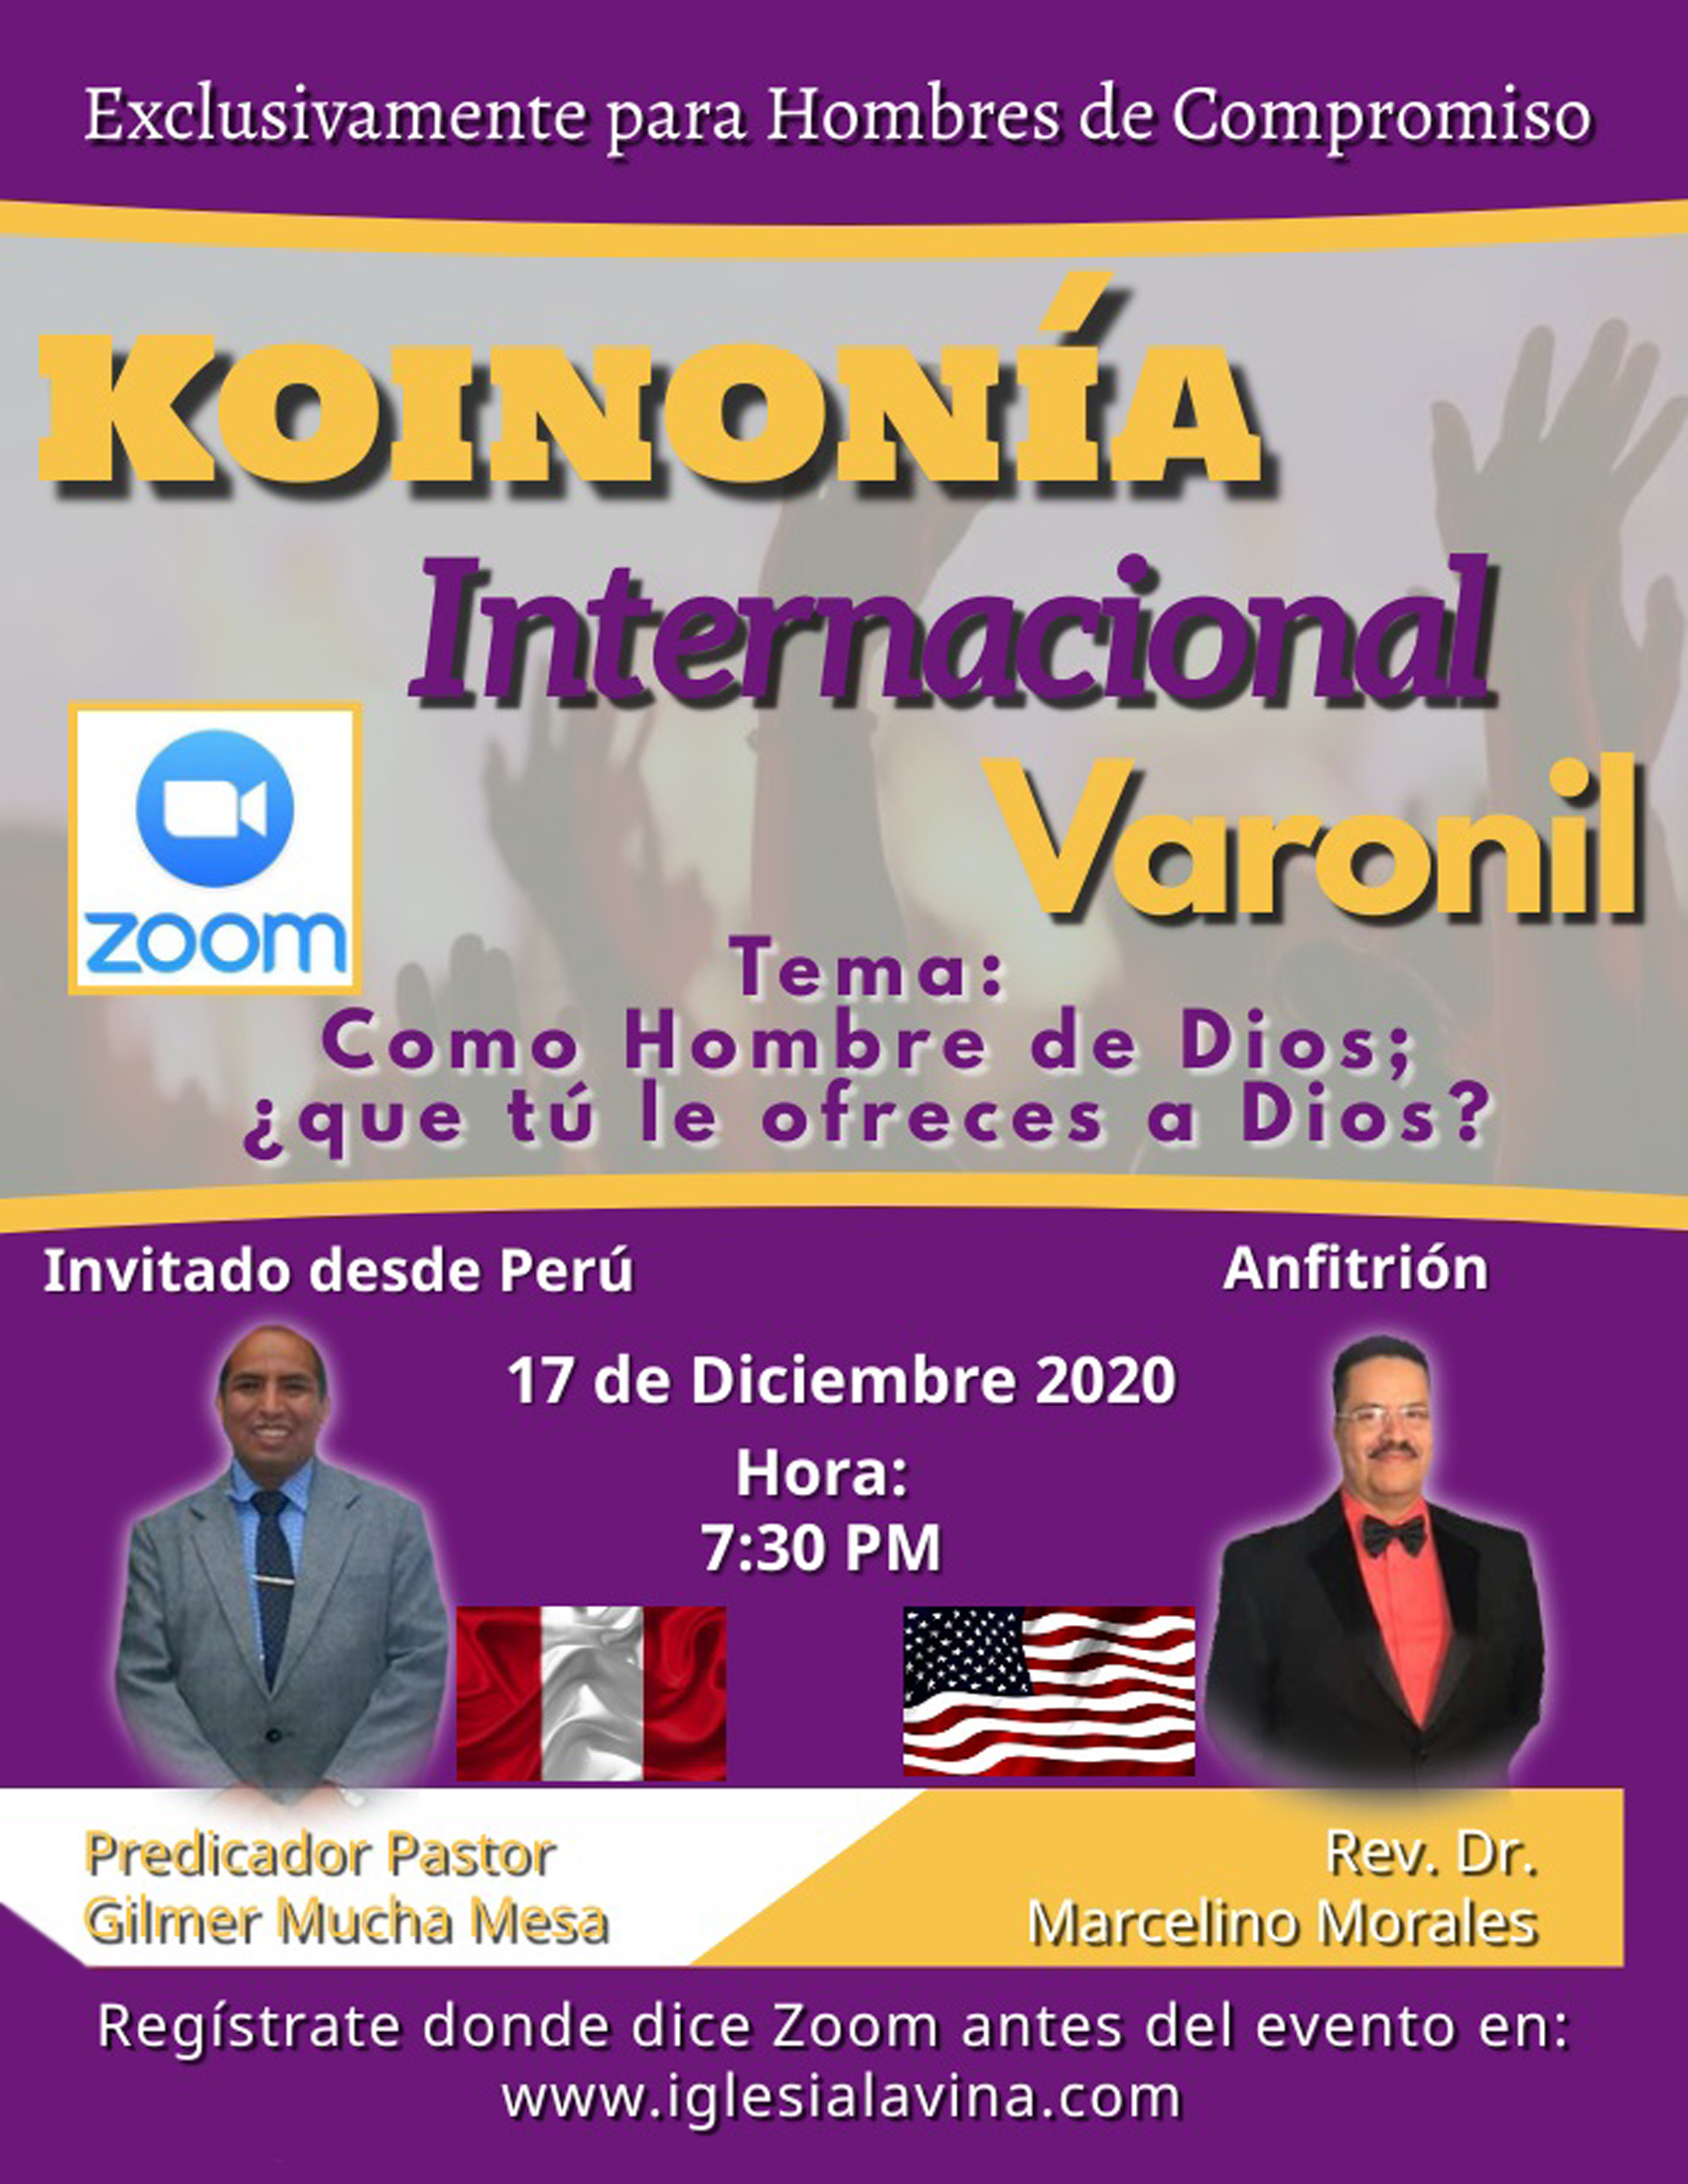 12-17-2020 - Pastor Gilmer Mucha Mesa Li